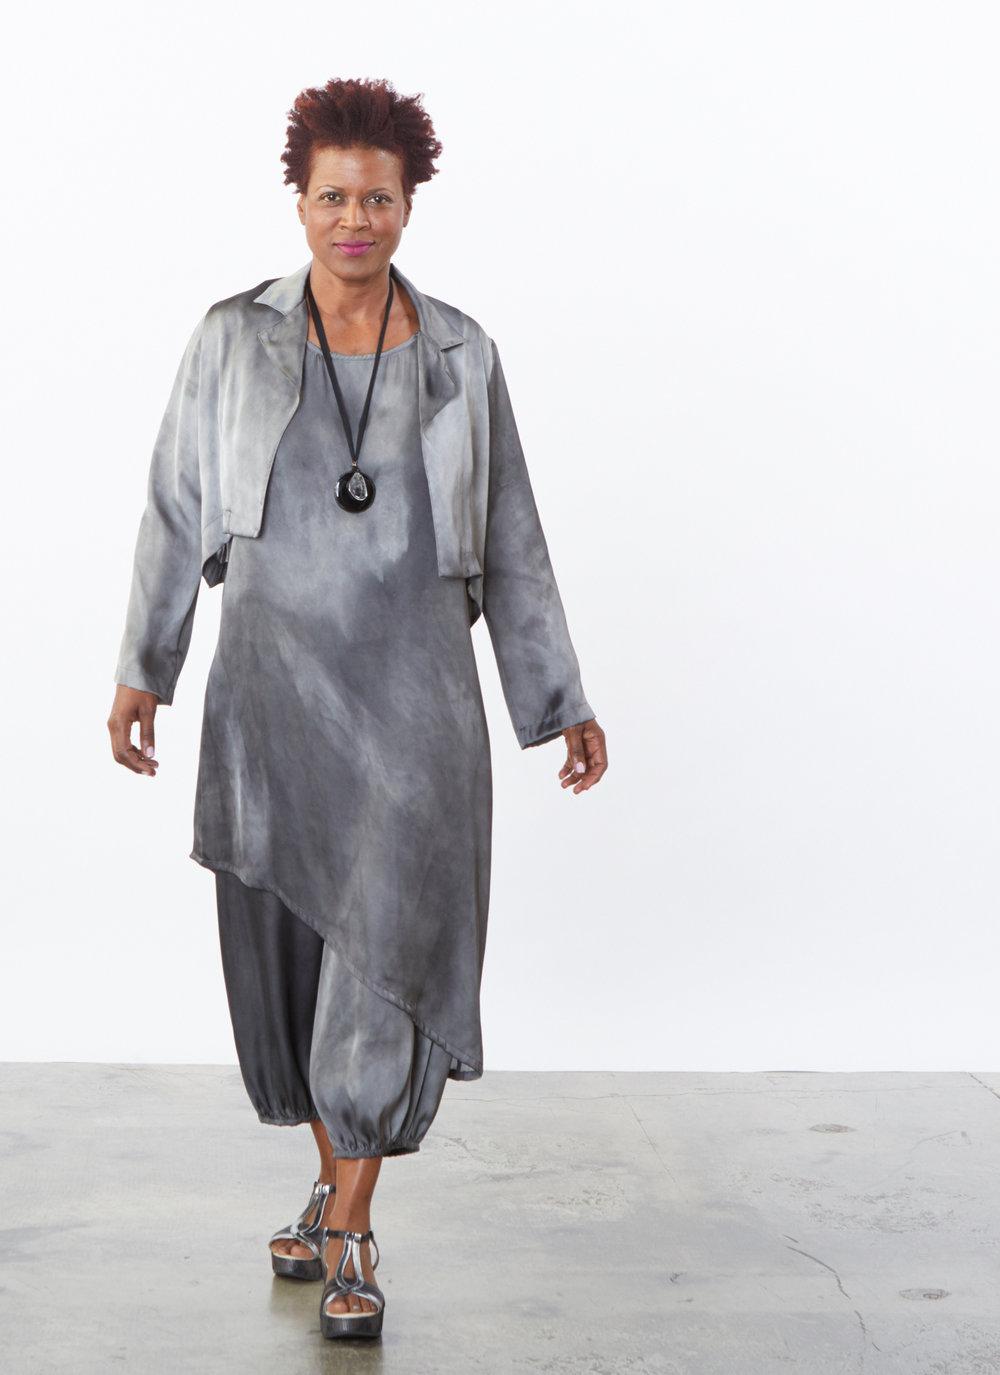 Hathaway Jacket, Euna Dress, Bell Pant in Moonglade Tie Dye